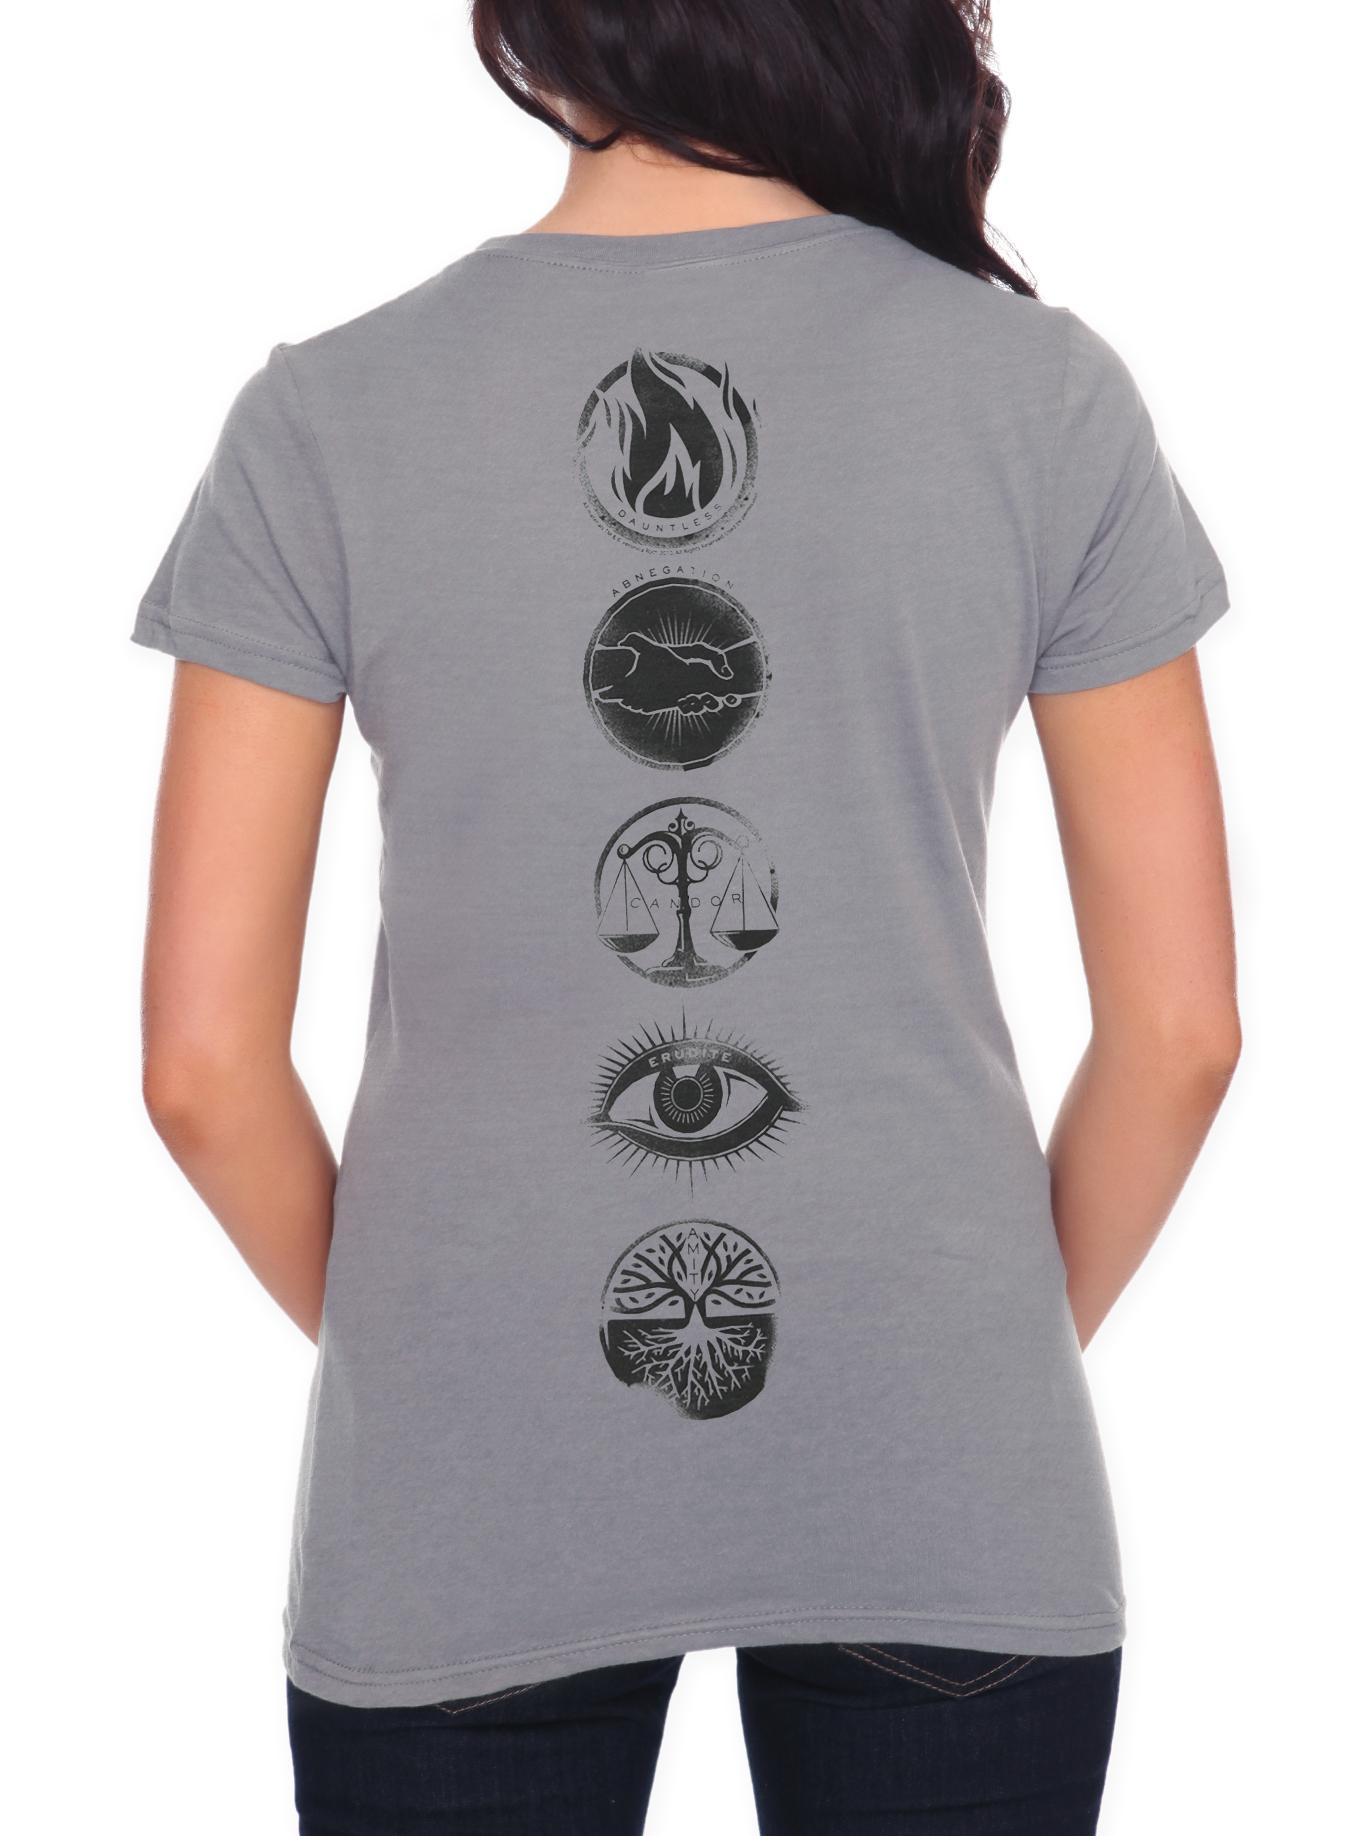 Divergent Five Factions Girls T-Shirt | Hot Topic